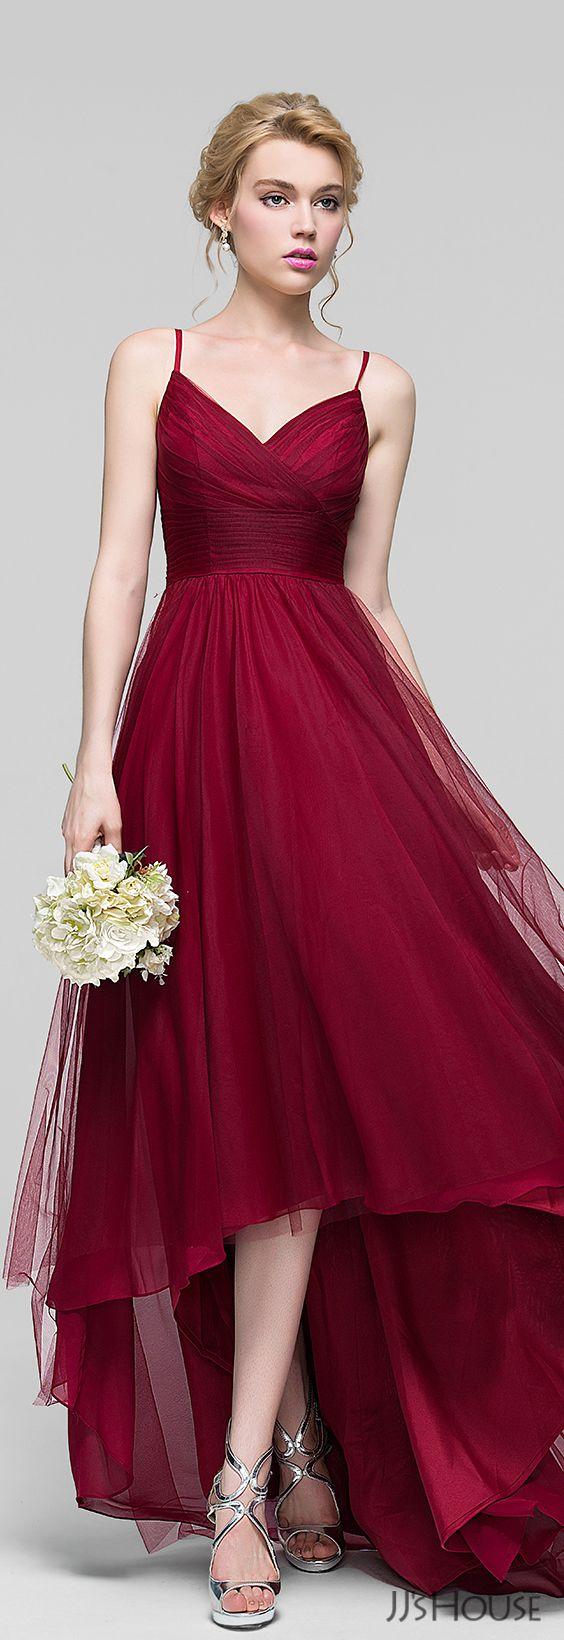 Jjshouse bridesmaid dresses pinterest formal dresses závoje